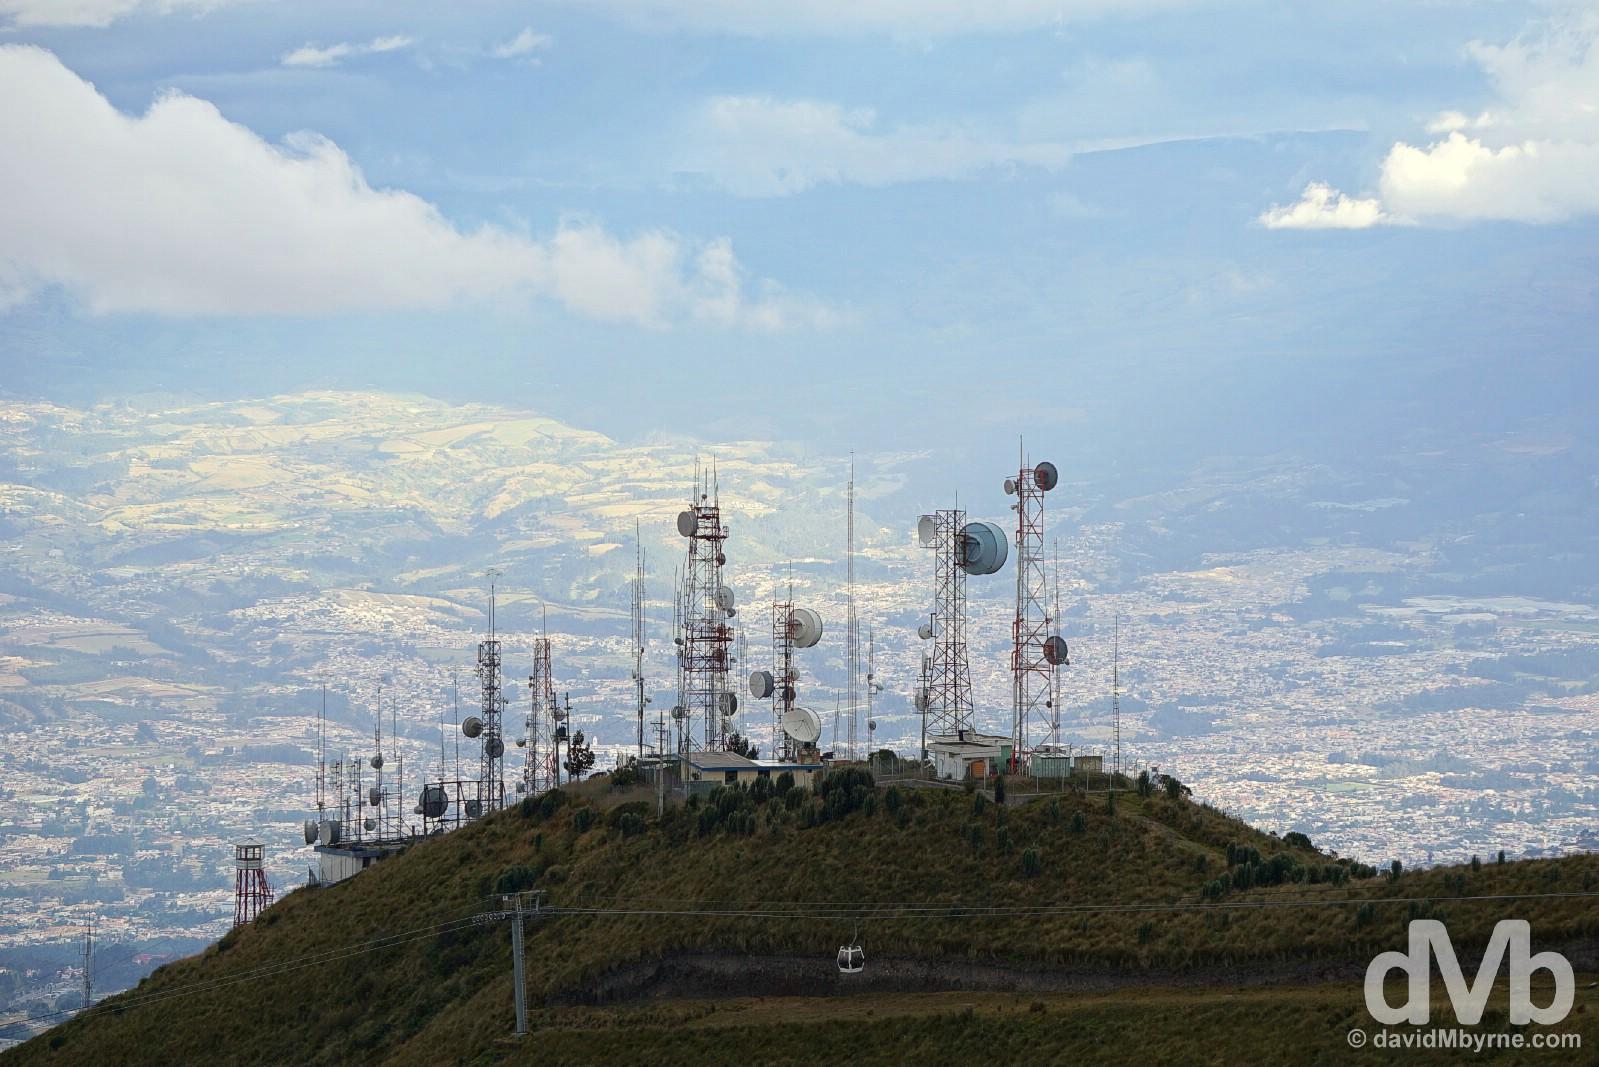 Teleferiqo on Cruz Loma overlooking Quito, Ecuador. July 5, 2015.